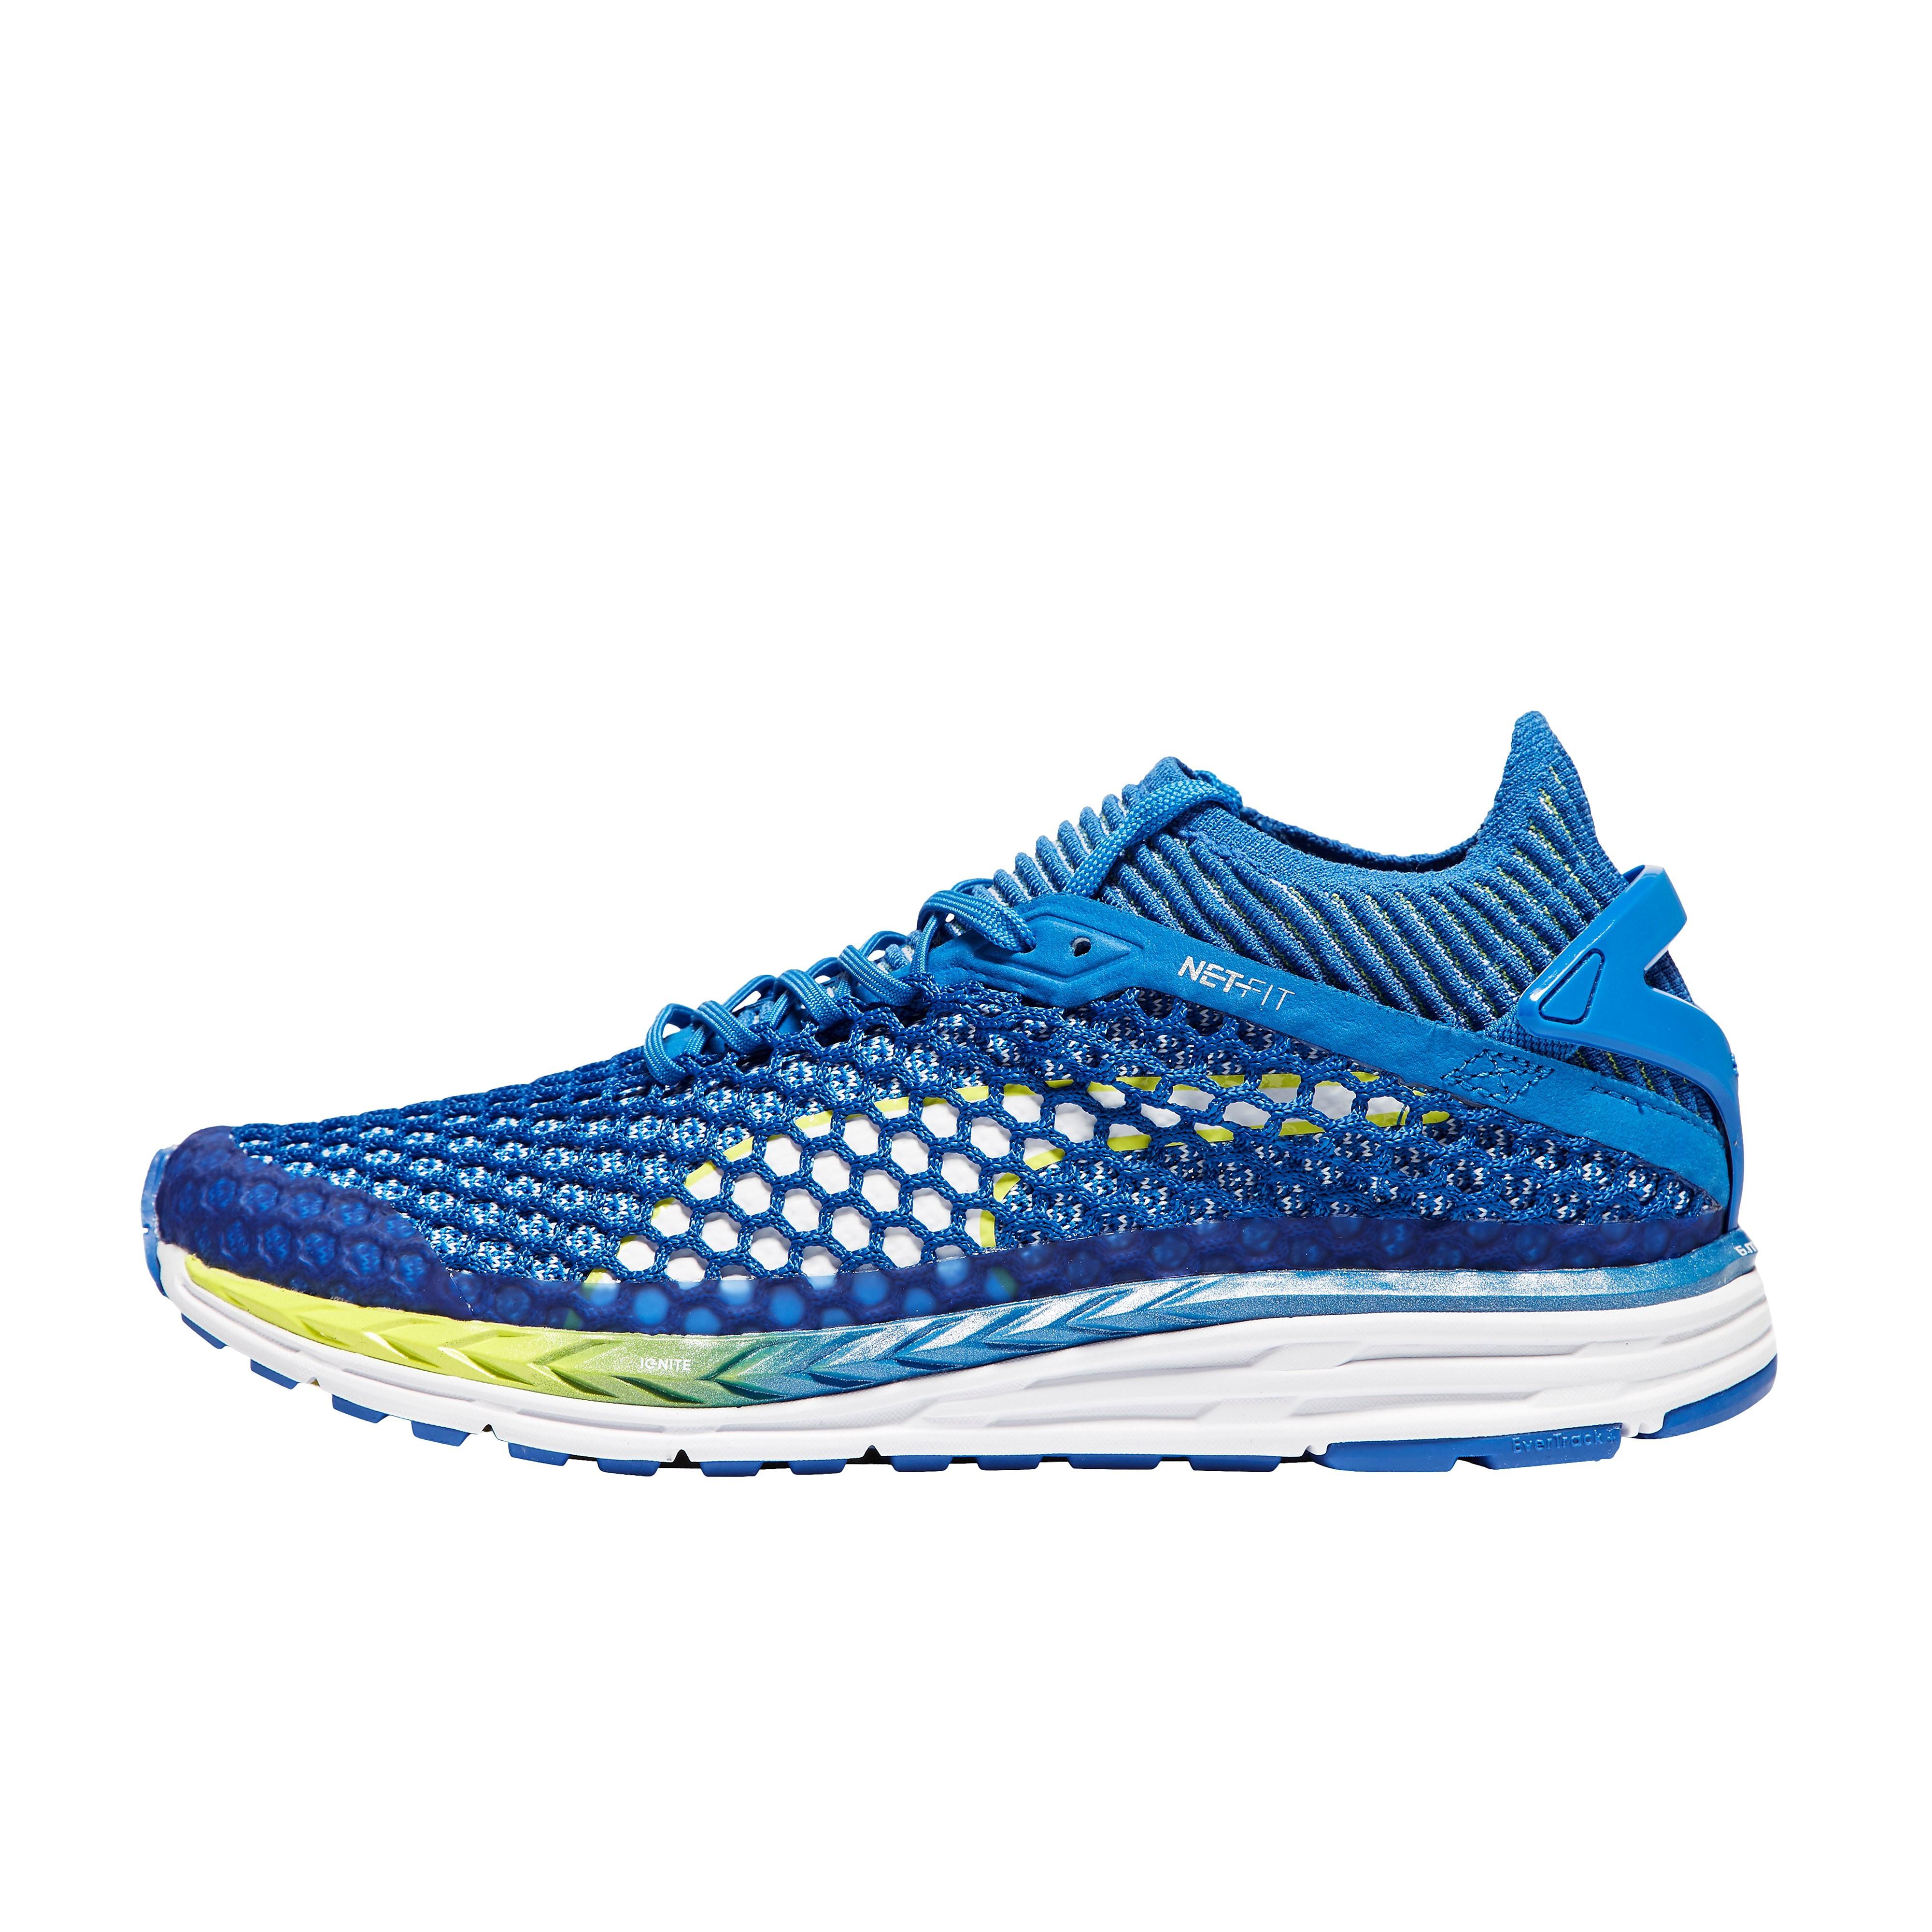 Puma Speed IGNITE NETFIT 2 Women's Running Shoes Image